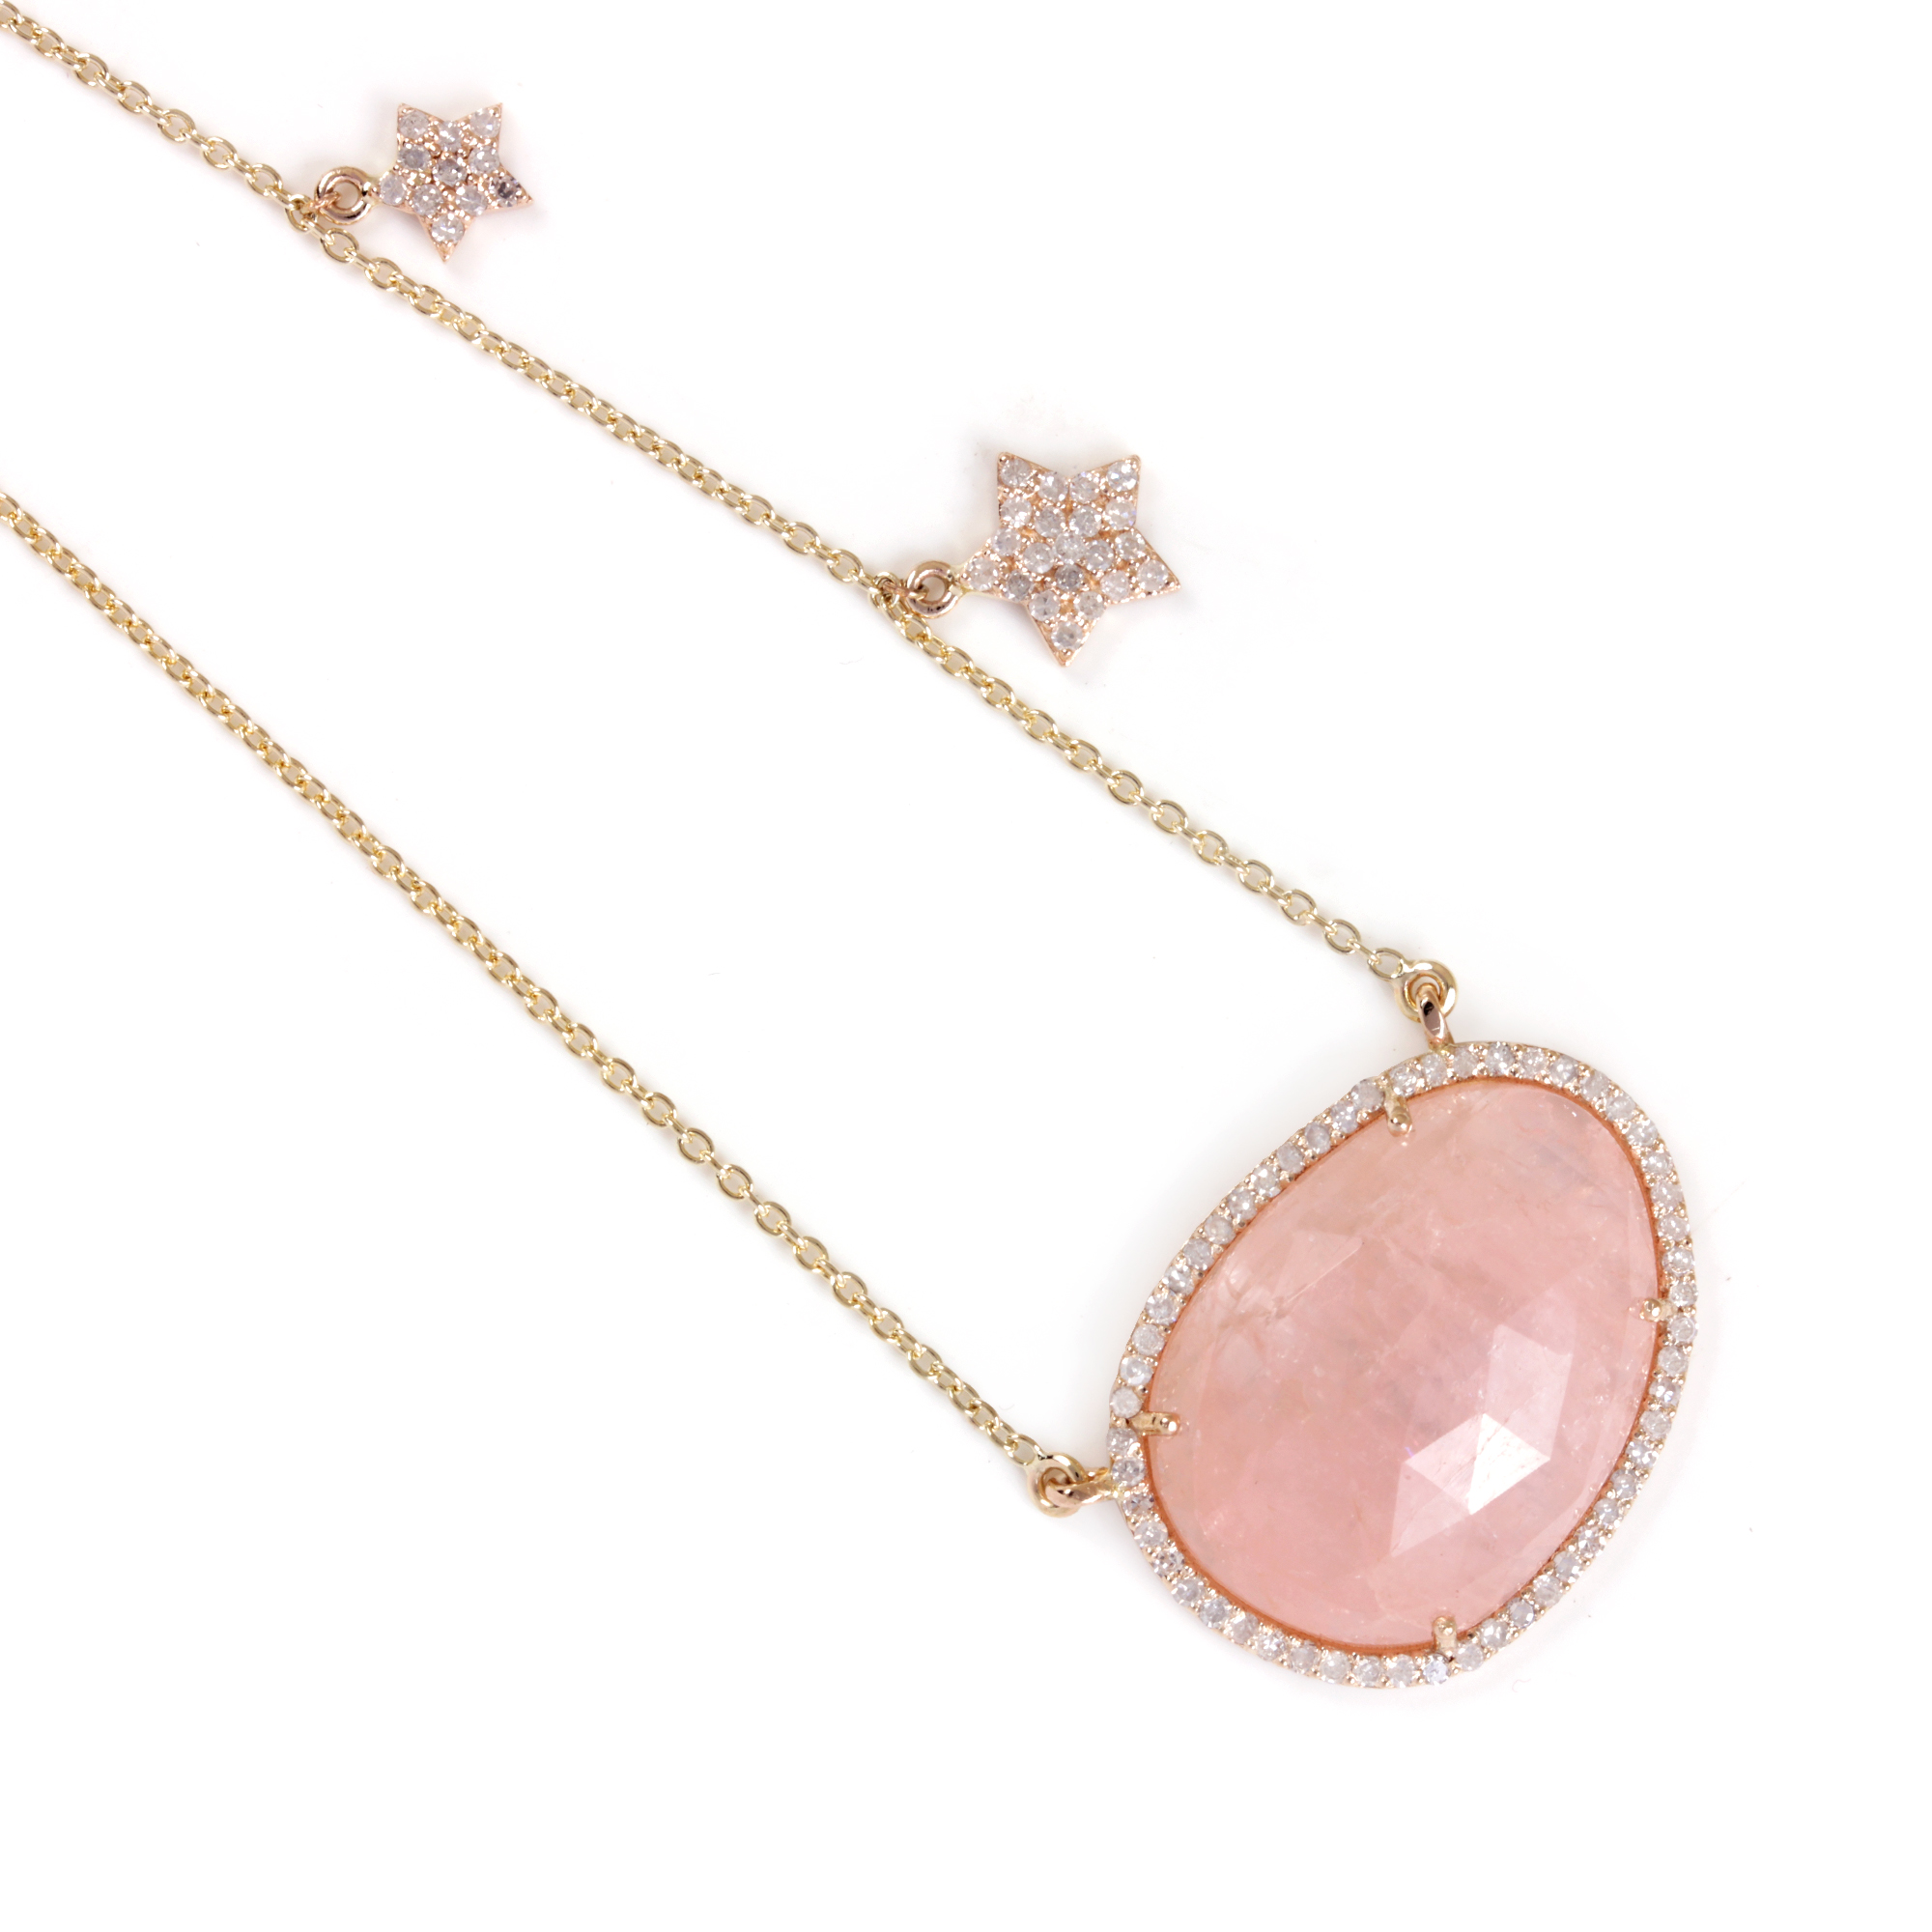 Rainbow Moonstone Pave Diamond 14K Solid Gold Pendant Necklace Jewelry